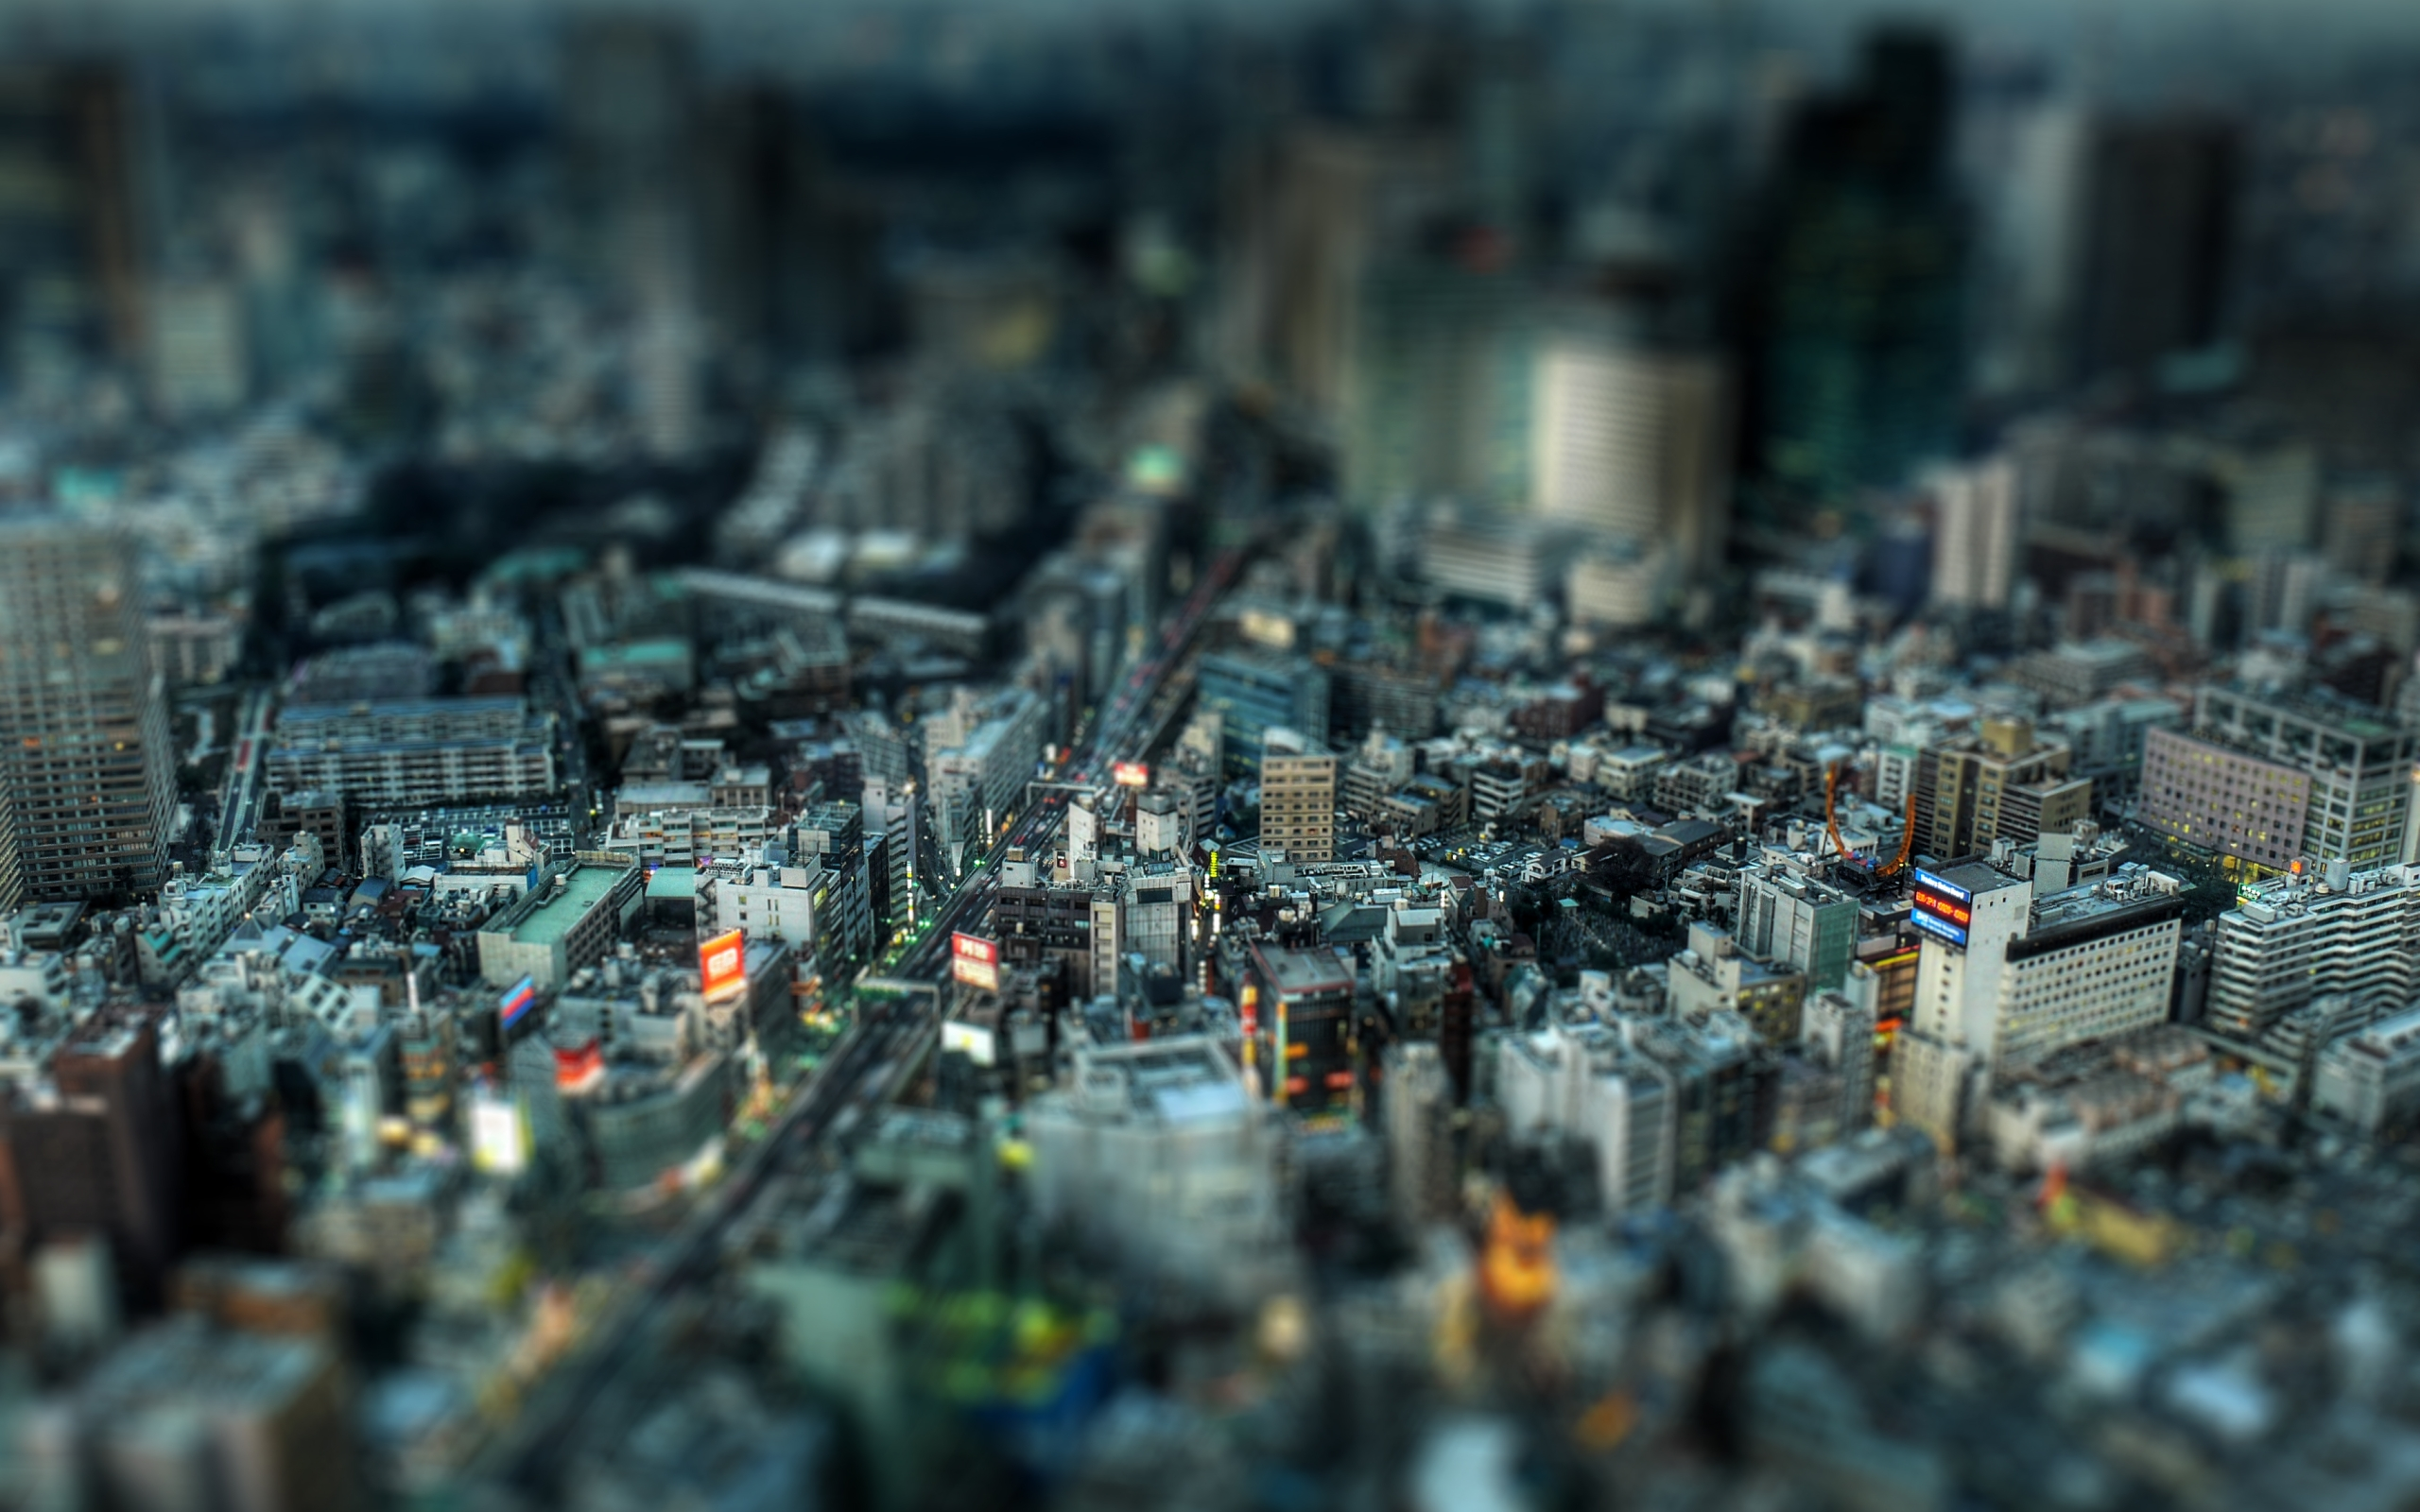 tilt shift effect toy city